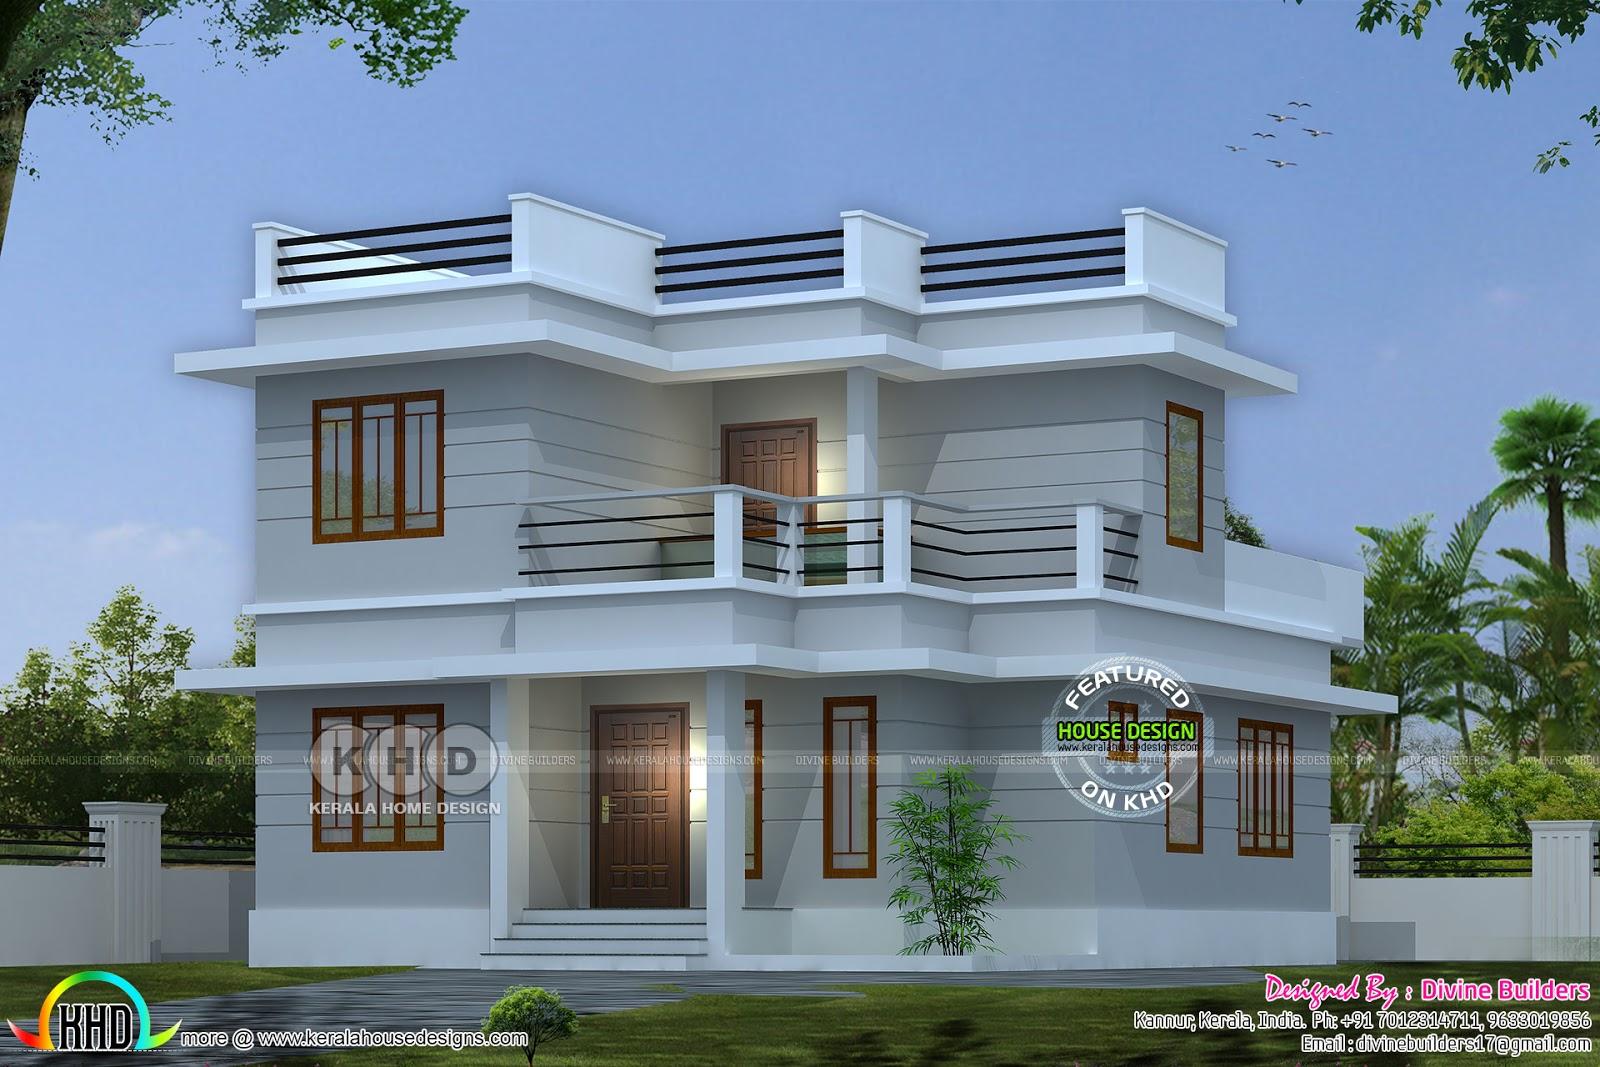 ₹20 lakhs cost estimated modern home 1211 sq-ft - Kerala